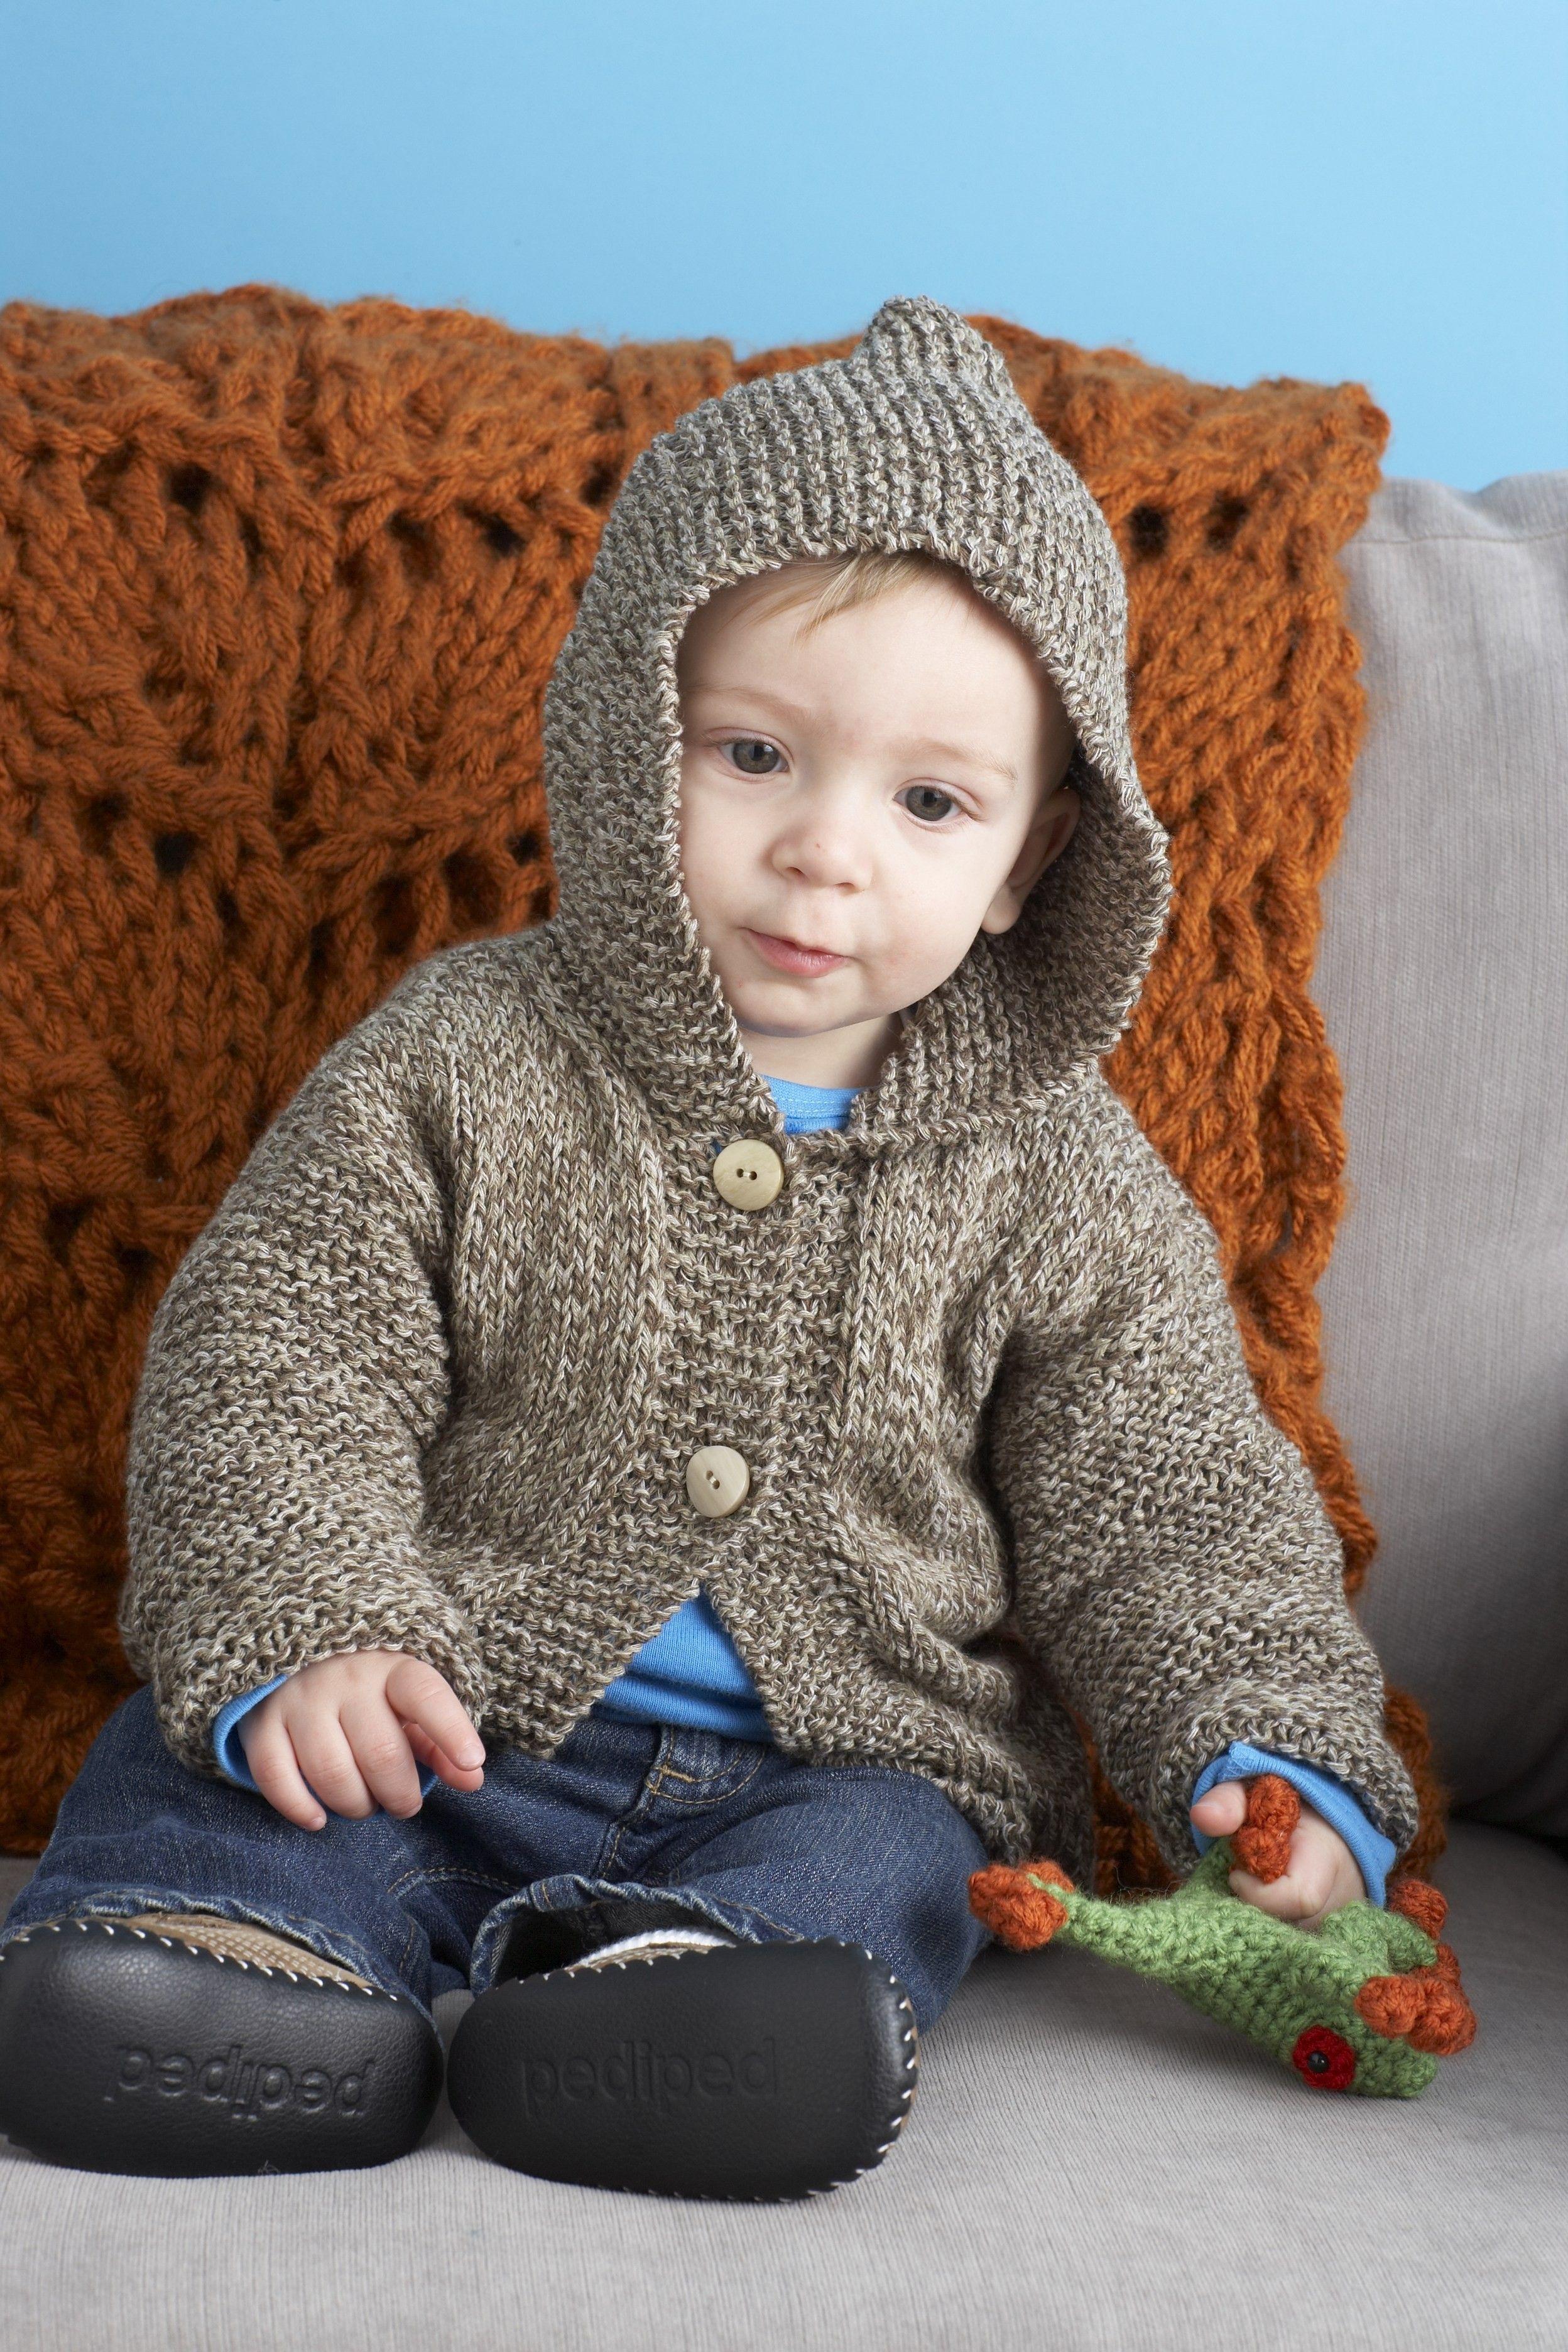 Playdate Hoodie Pattern Knit Free Download Crafting Knitting